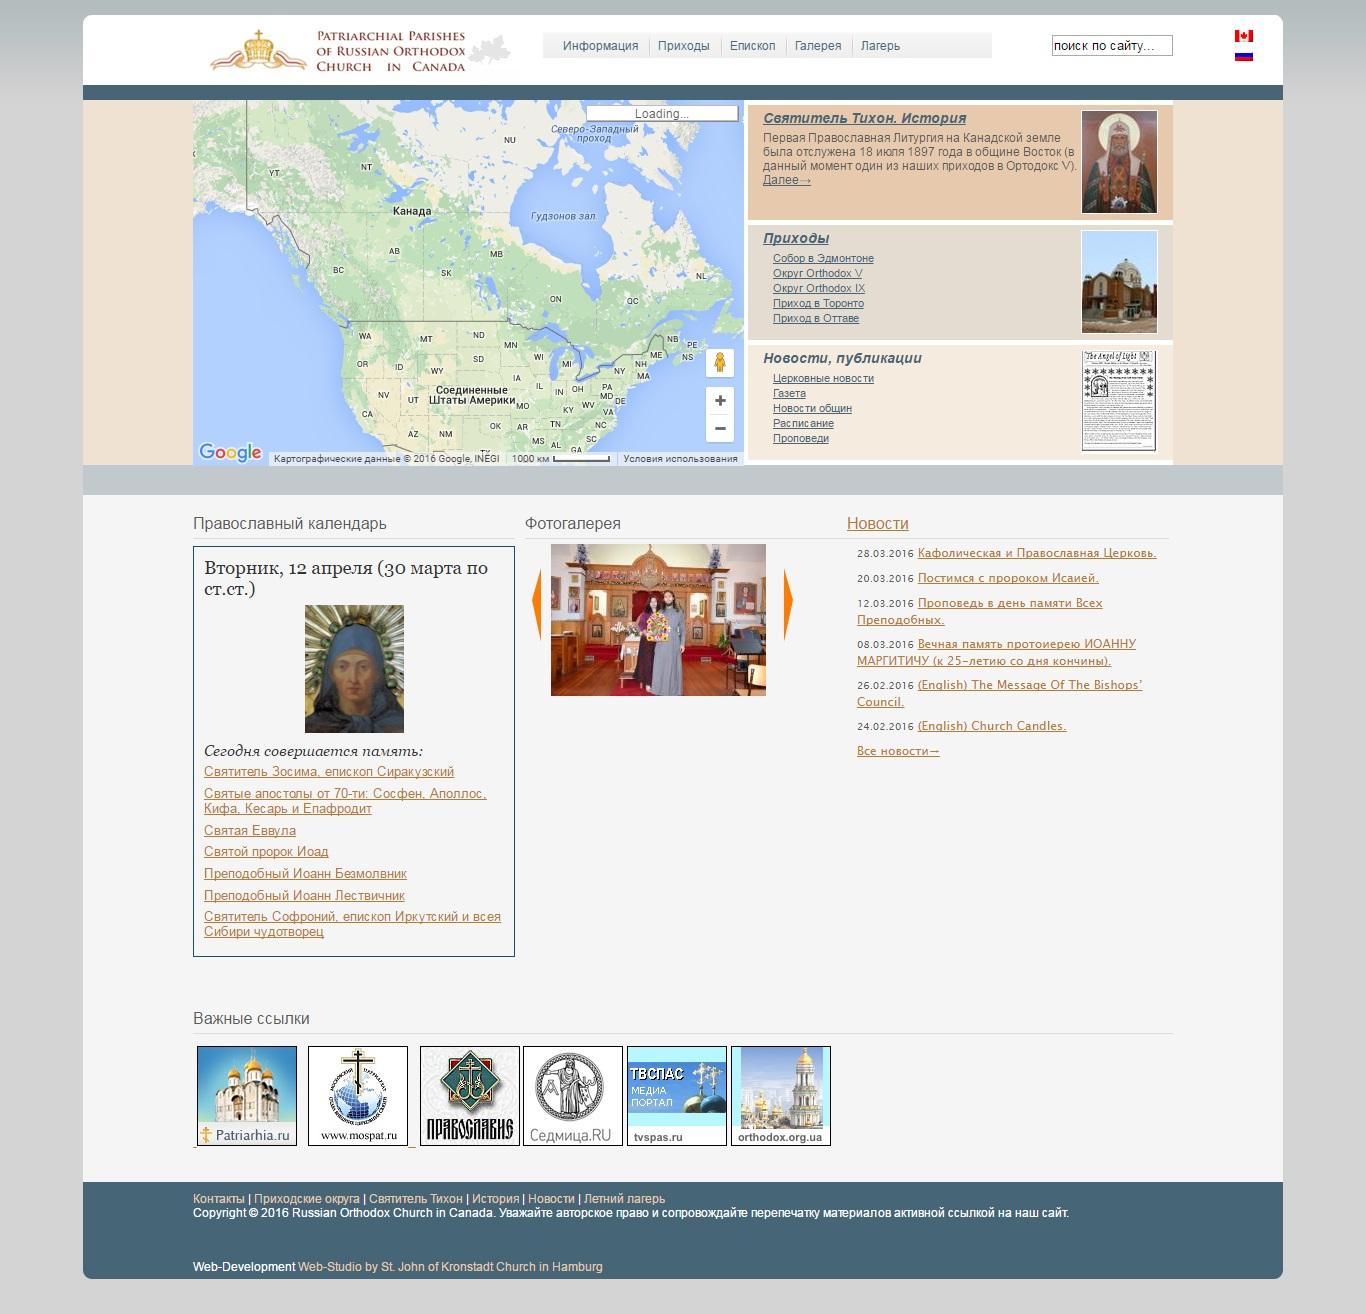 Russische Orthodoxe Kirche in Kanada